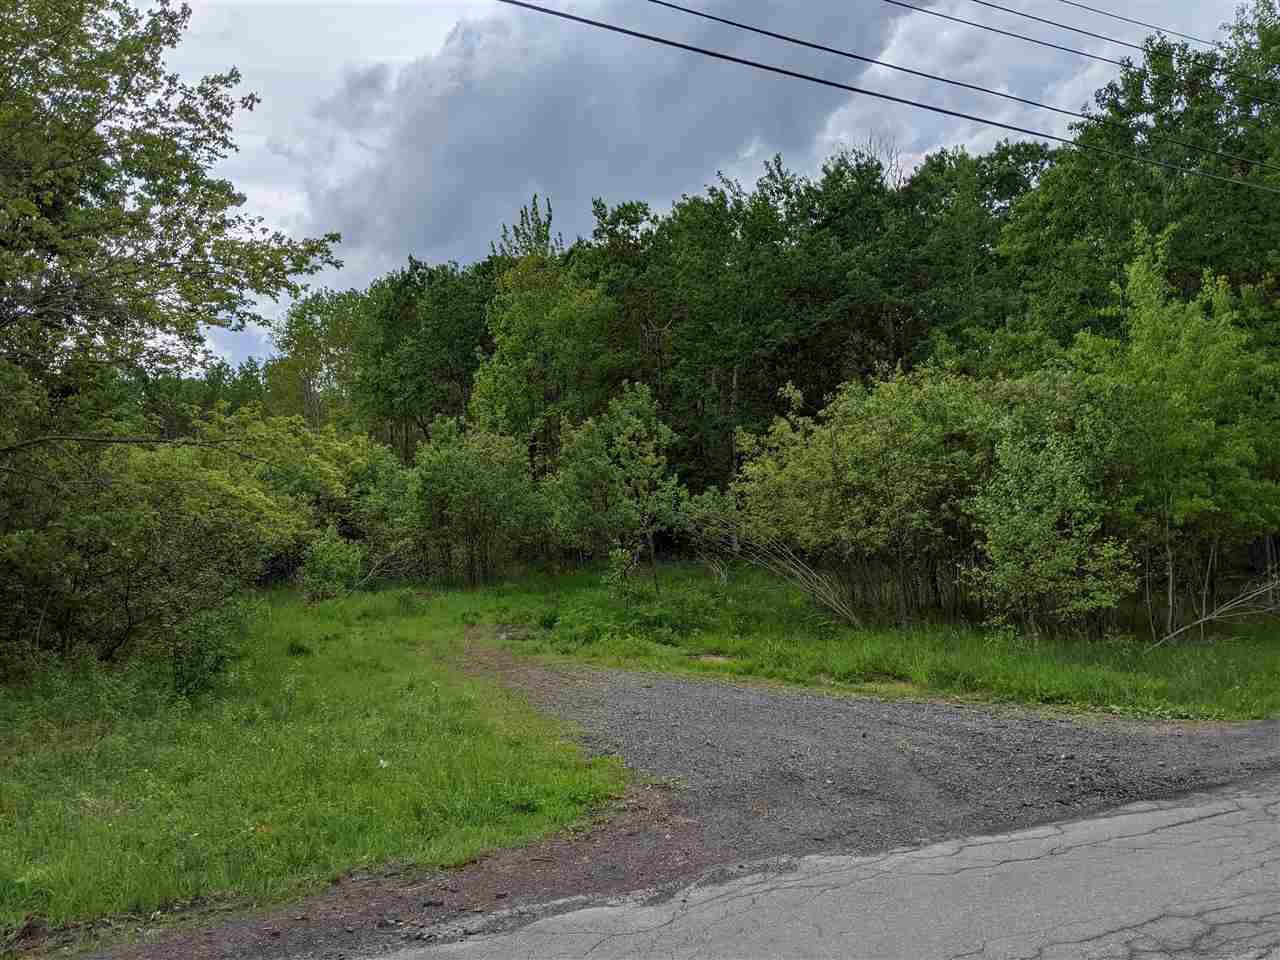 Main Photo: 205 Eighth Street in New Glasgow: 106-New Glasgow, Stellarton Vacant Land for sale (Northern Region)  : MLS®# 202010246